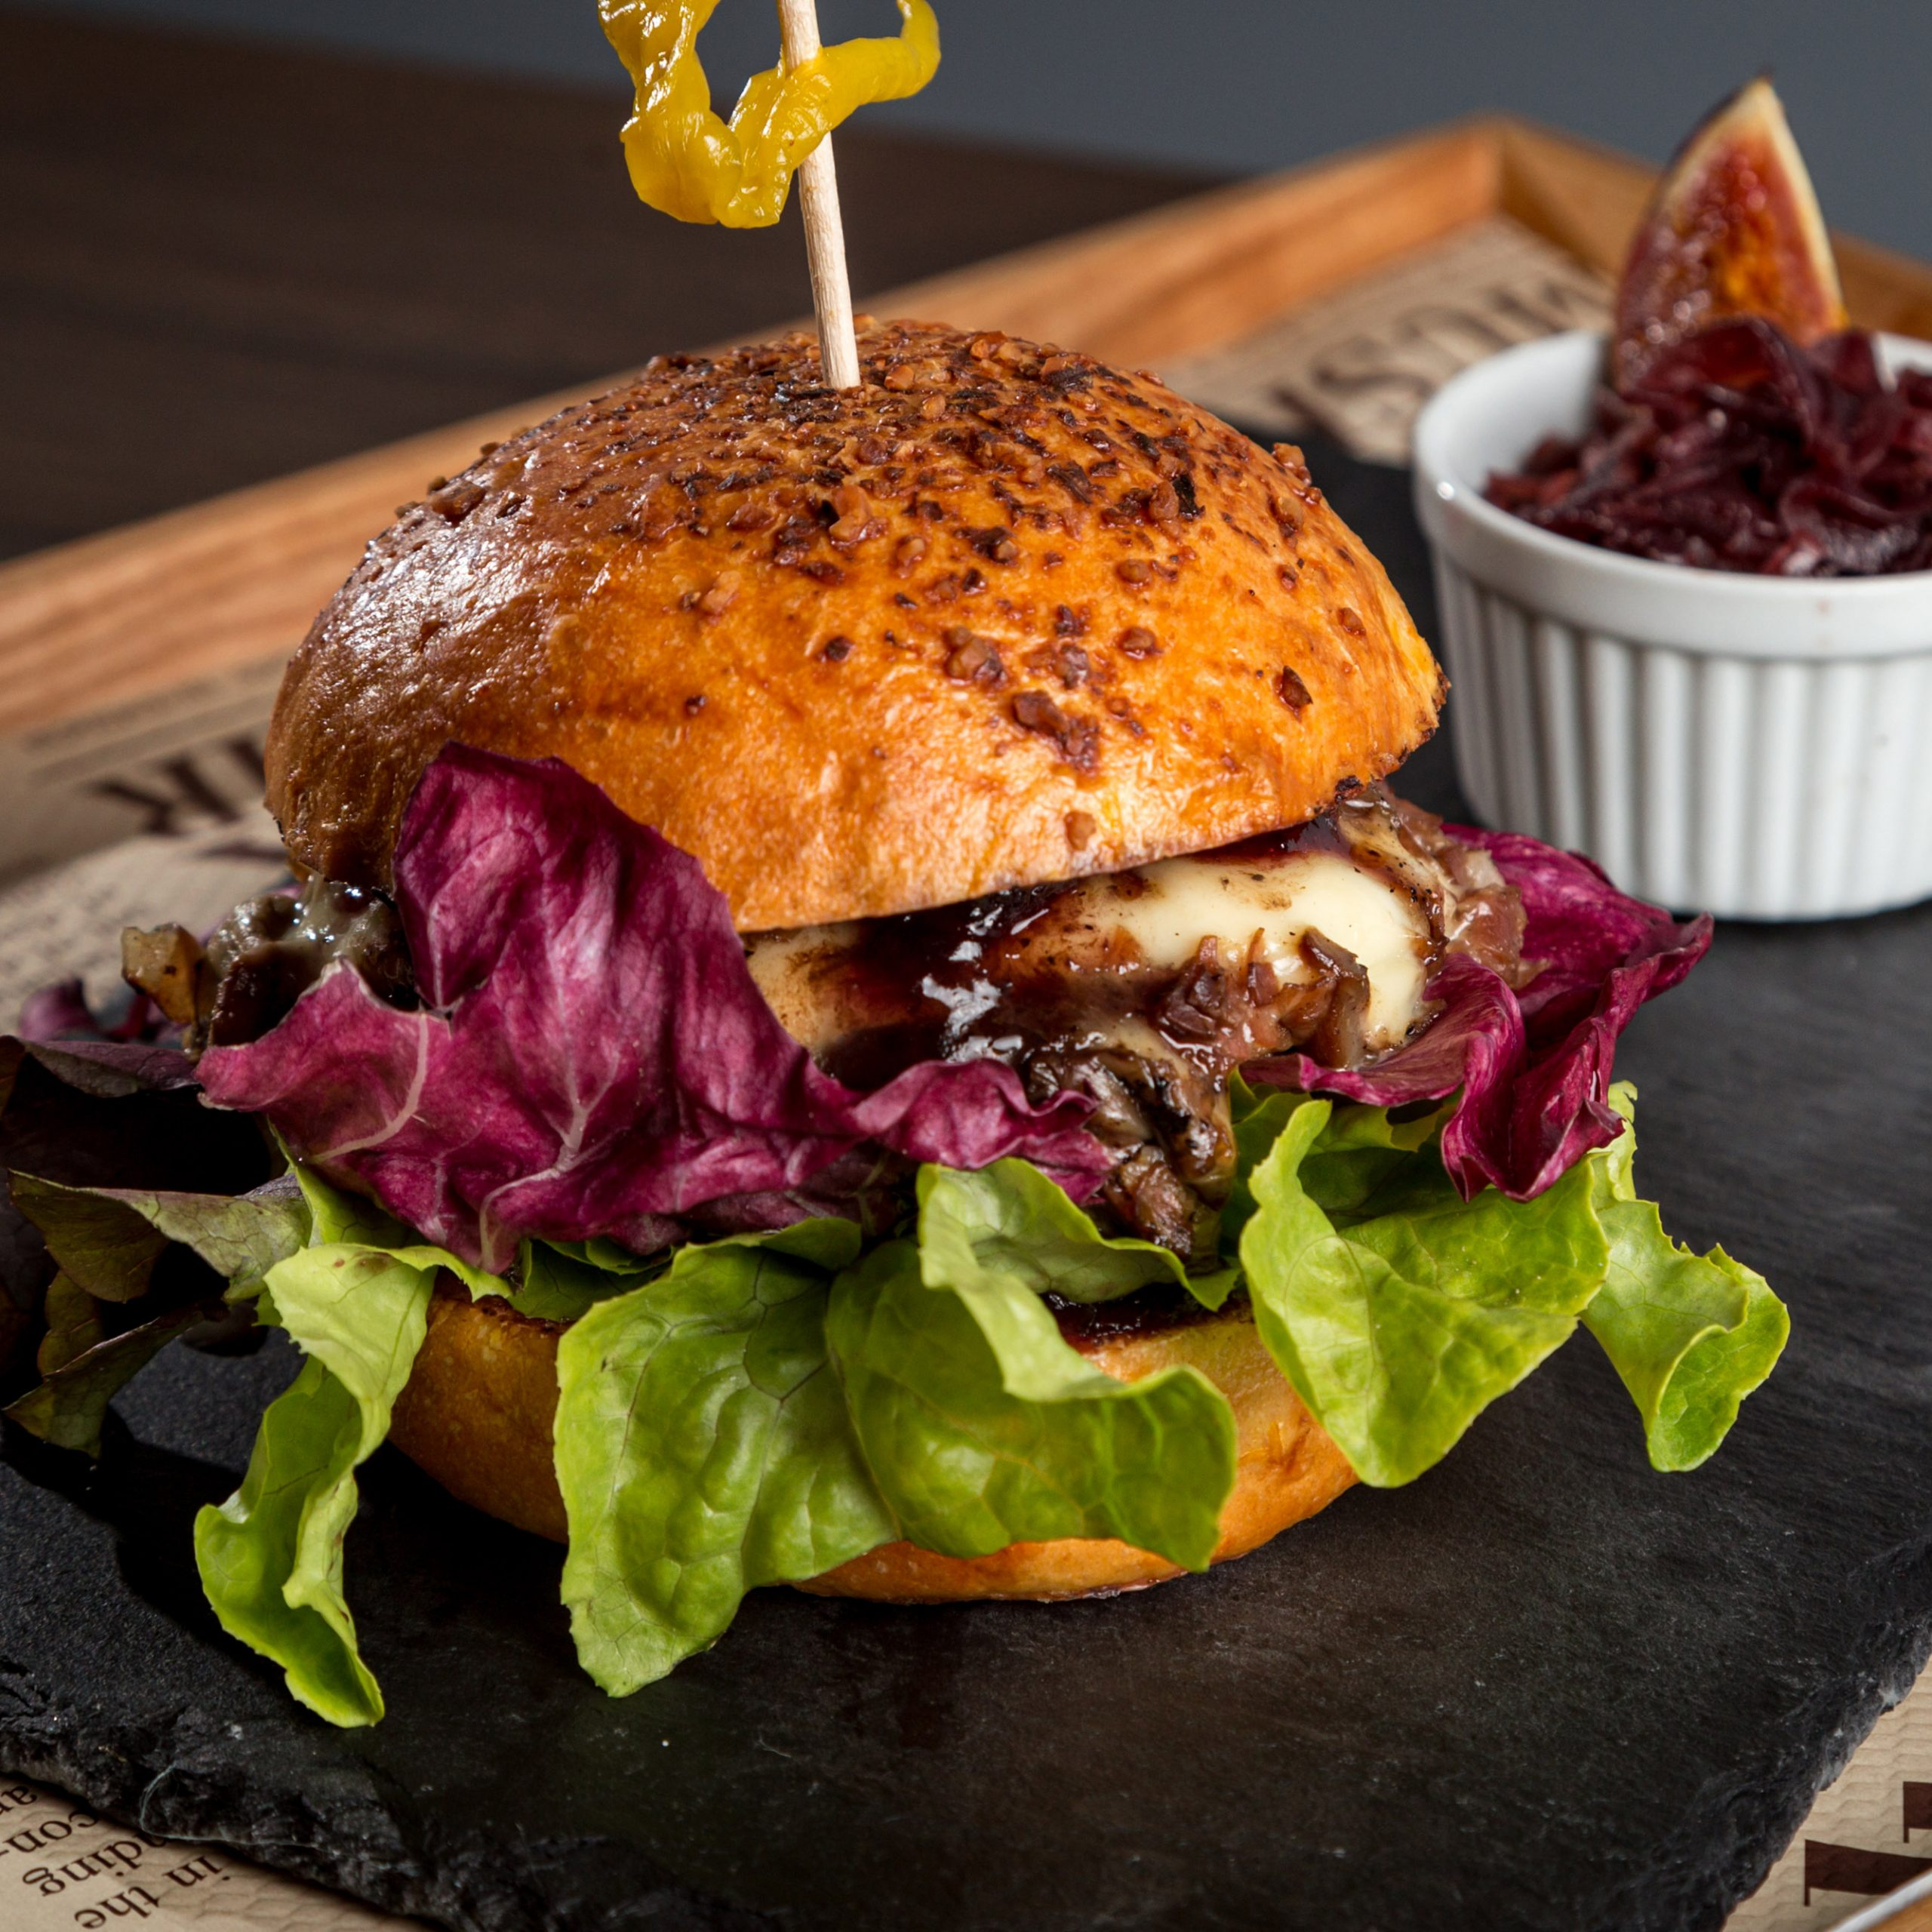 szarvas burger